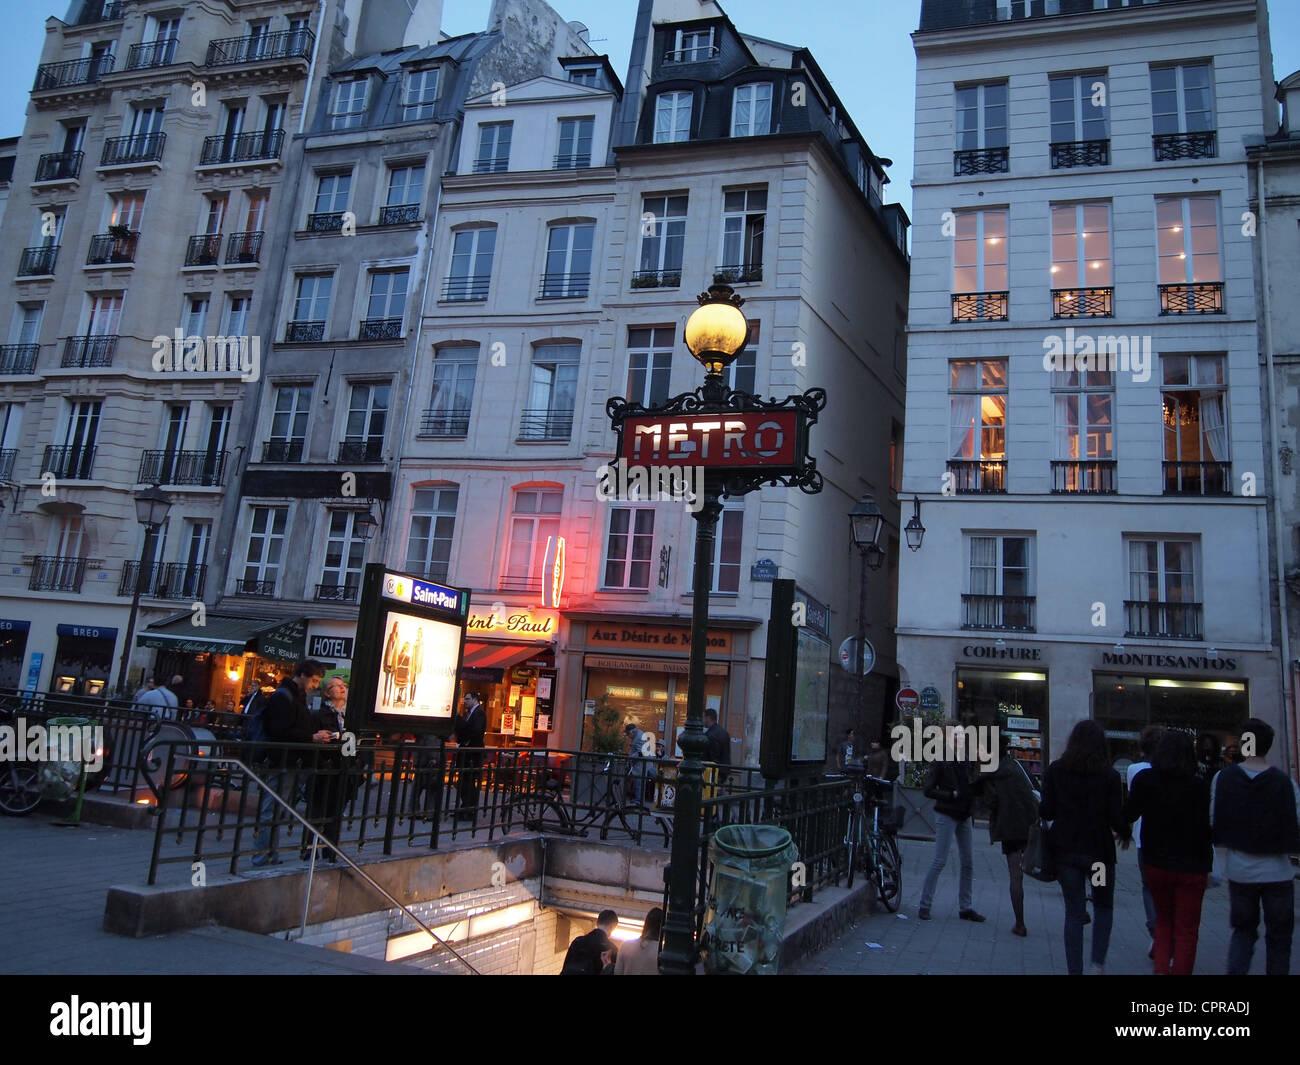 saint paul metro station on rue saint antoine at dusk paris stock photo 48456286 alamy. Black Bedroom Furniture Sets. Home Design Ideas